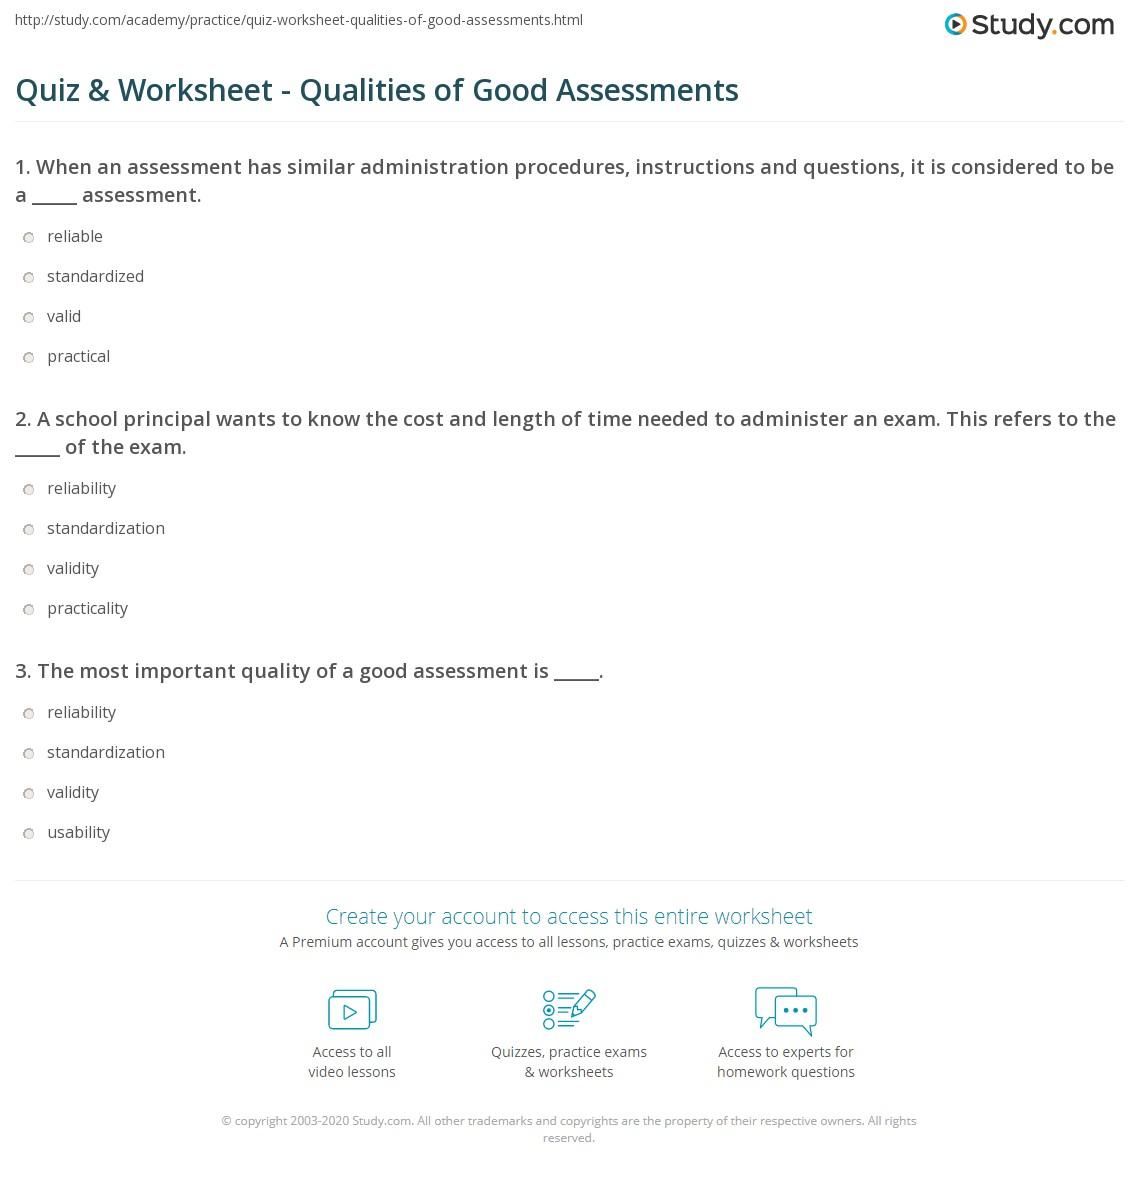 quiz worksheet qualities of good assessments. Black Bedroom Furniture Sets. Home Design Ideas